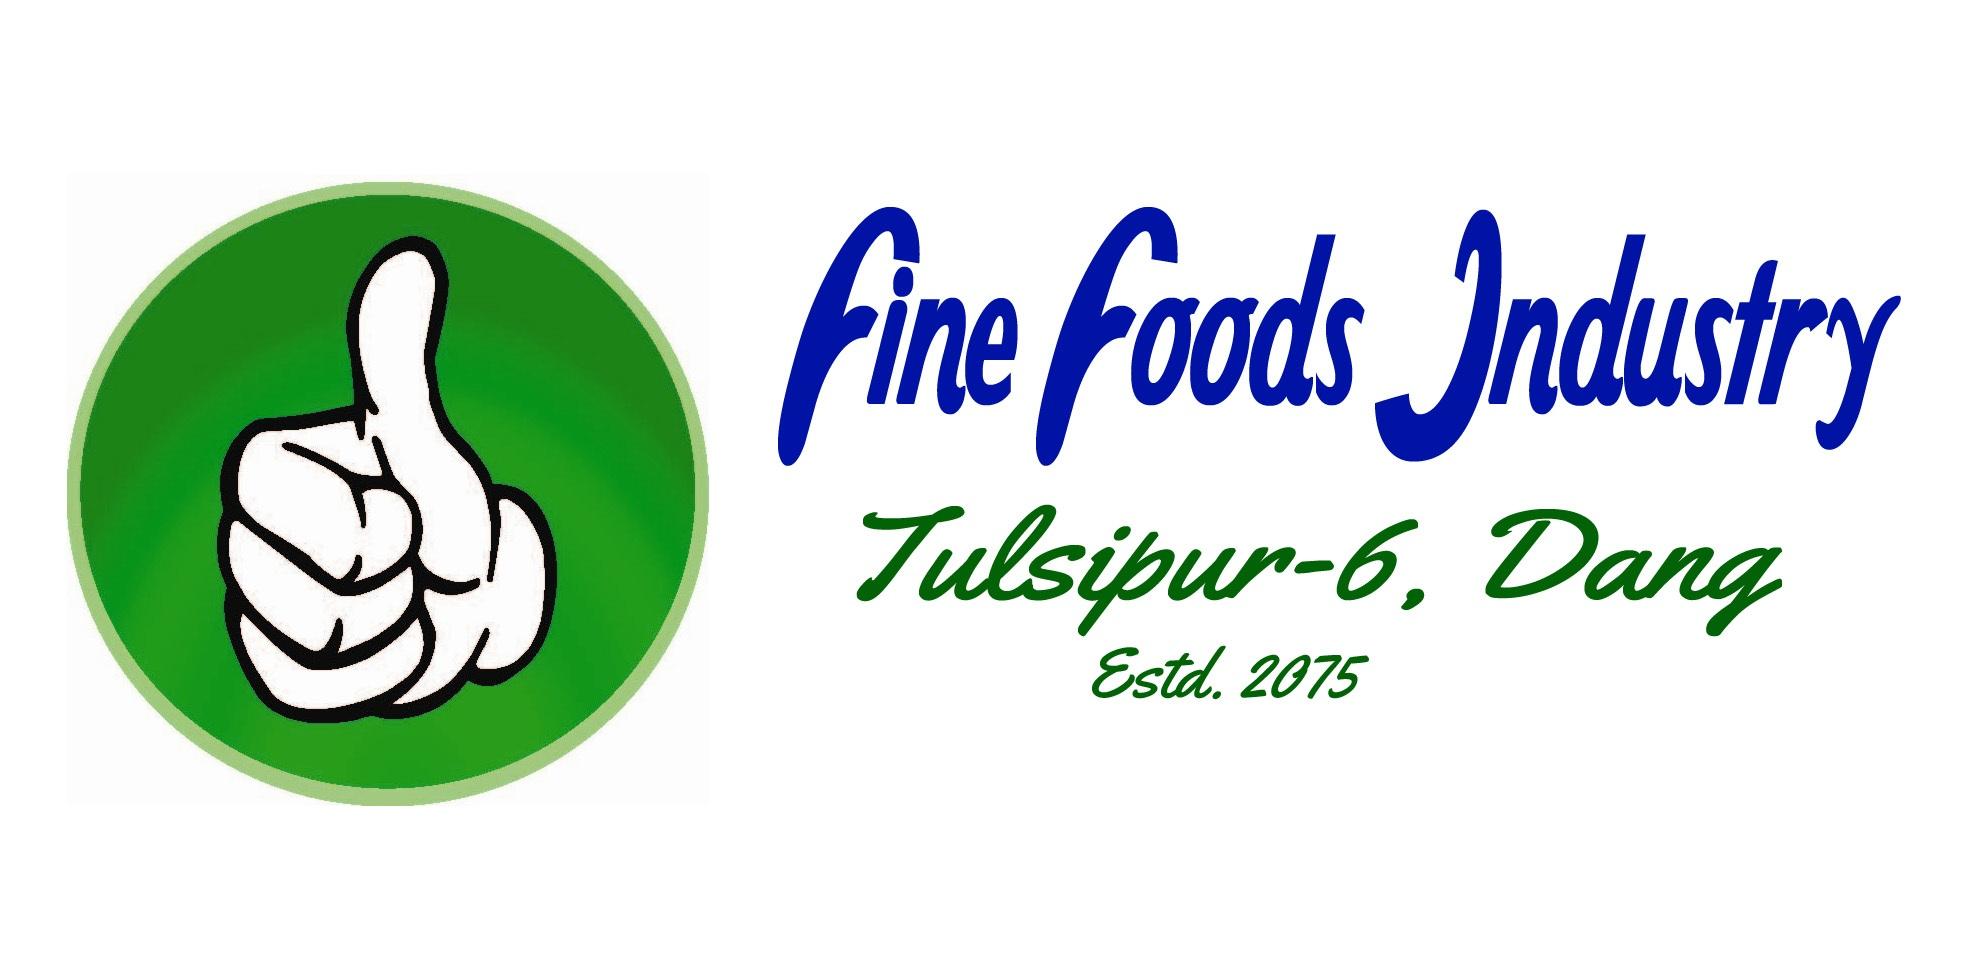 Fine Foods Industry image